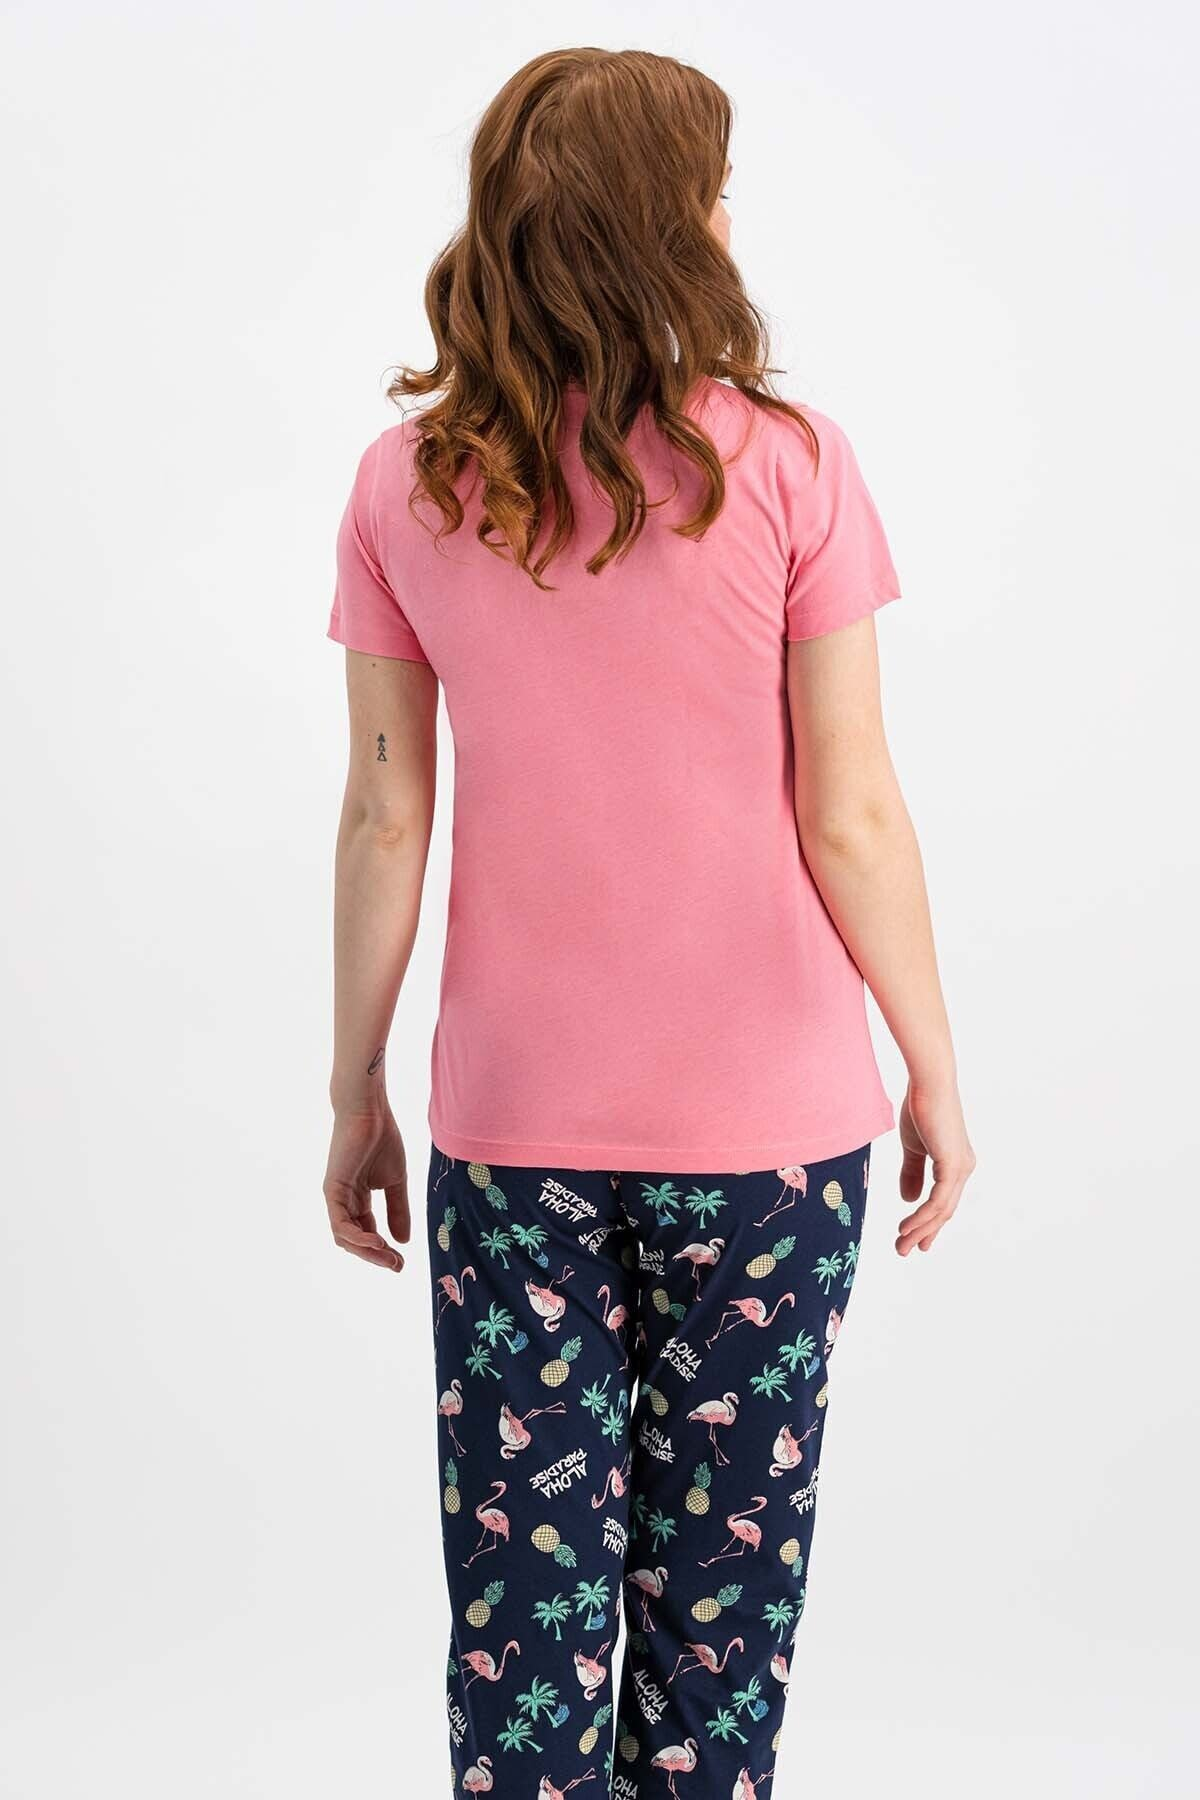 ROLY POLY Kadın Şeker Pembe Kısa Kollu Pijama Takımı 2